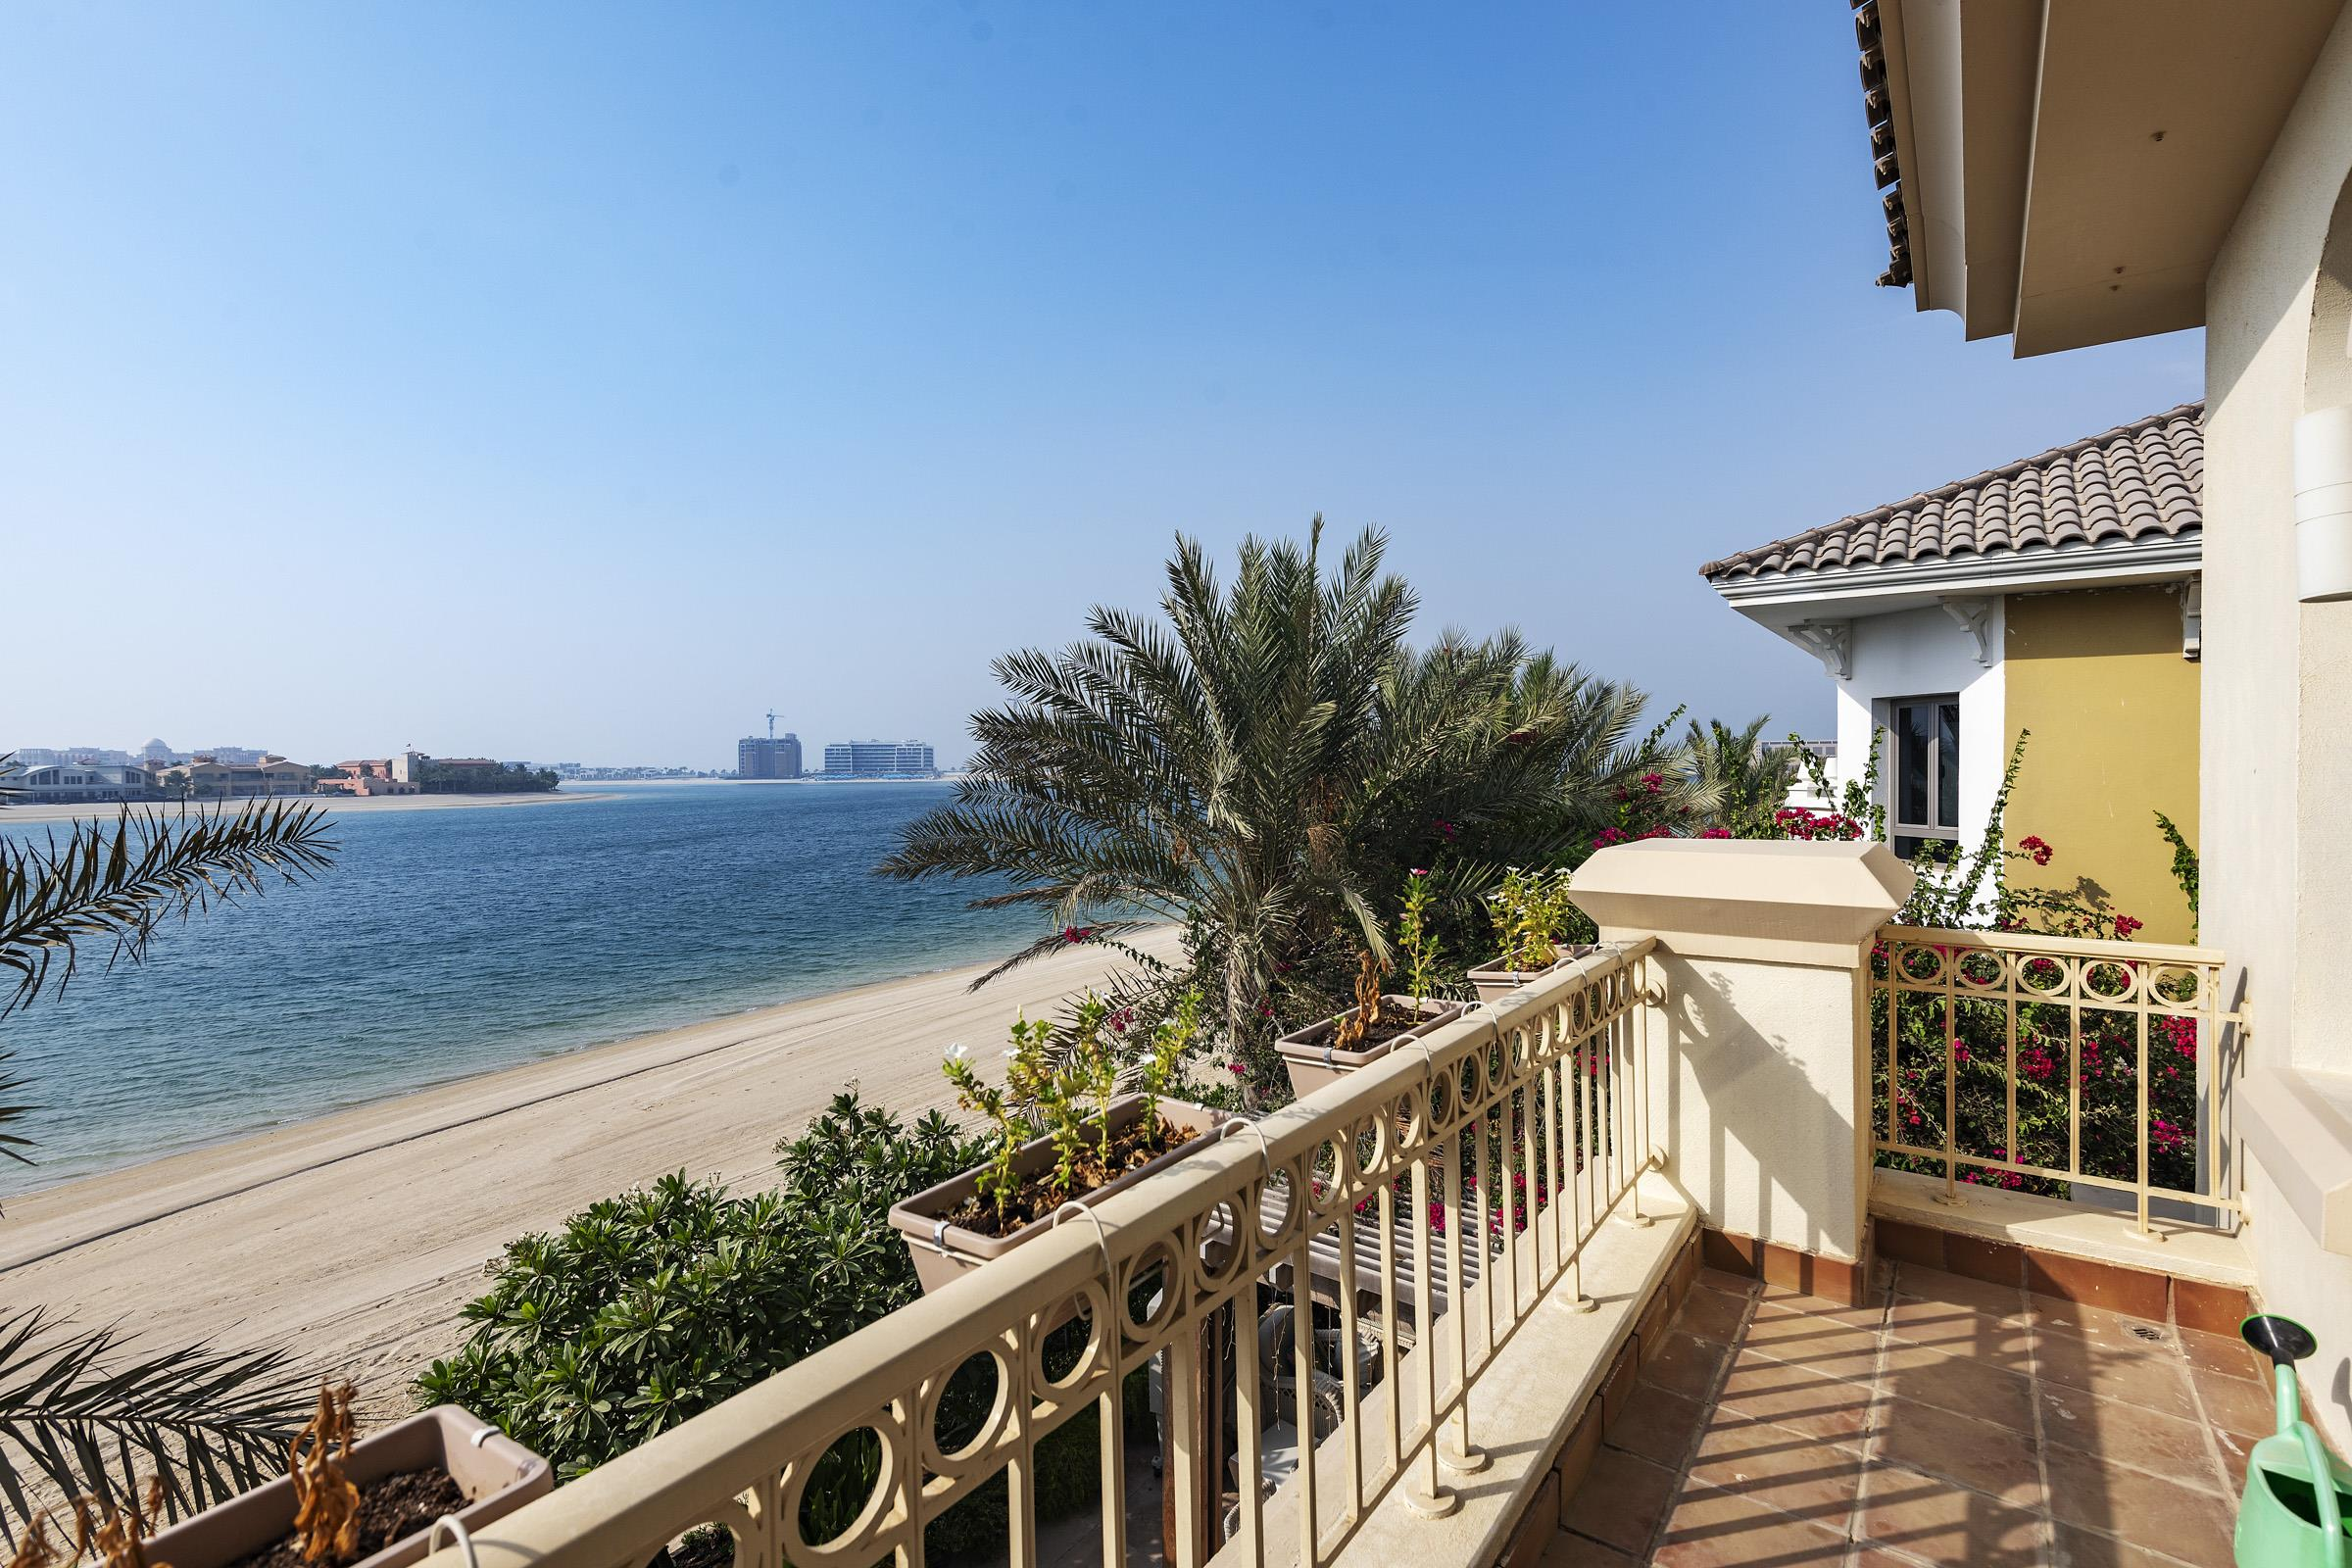 5 Bed  Mediterranean with  Atlantis view